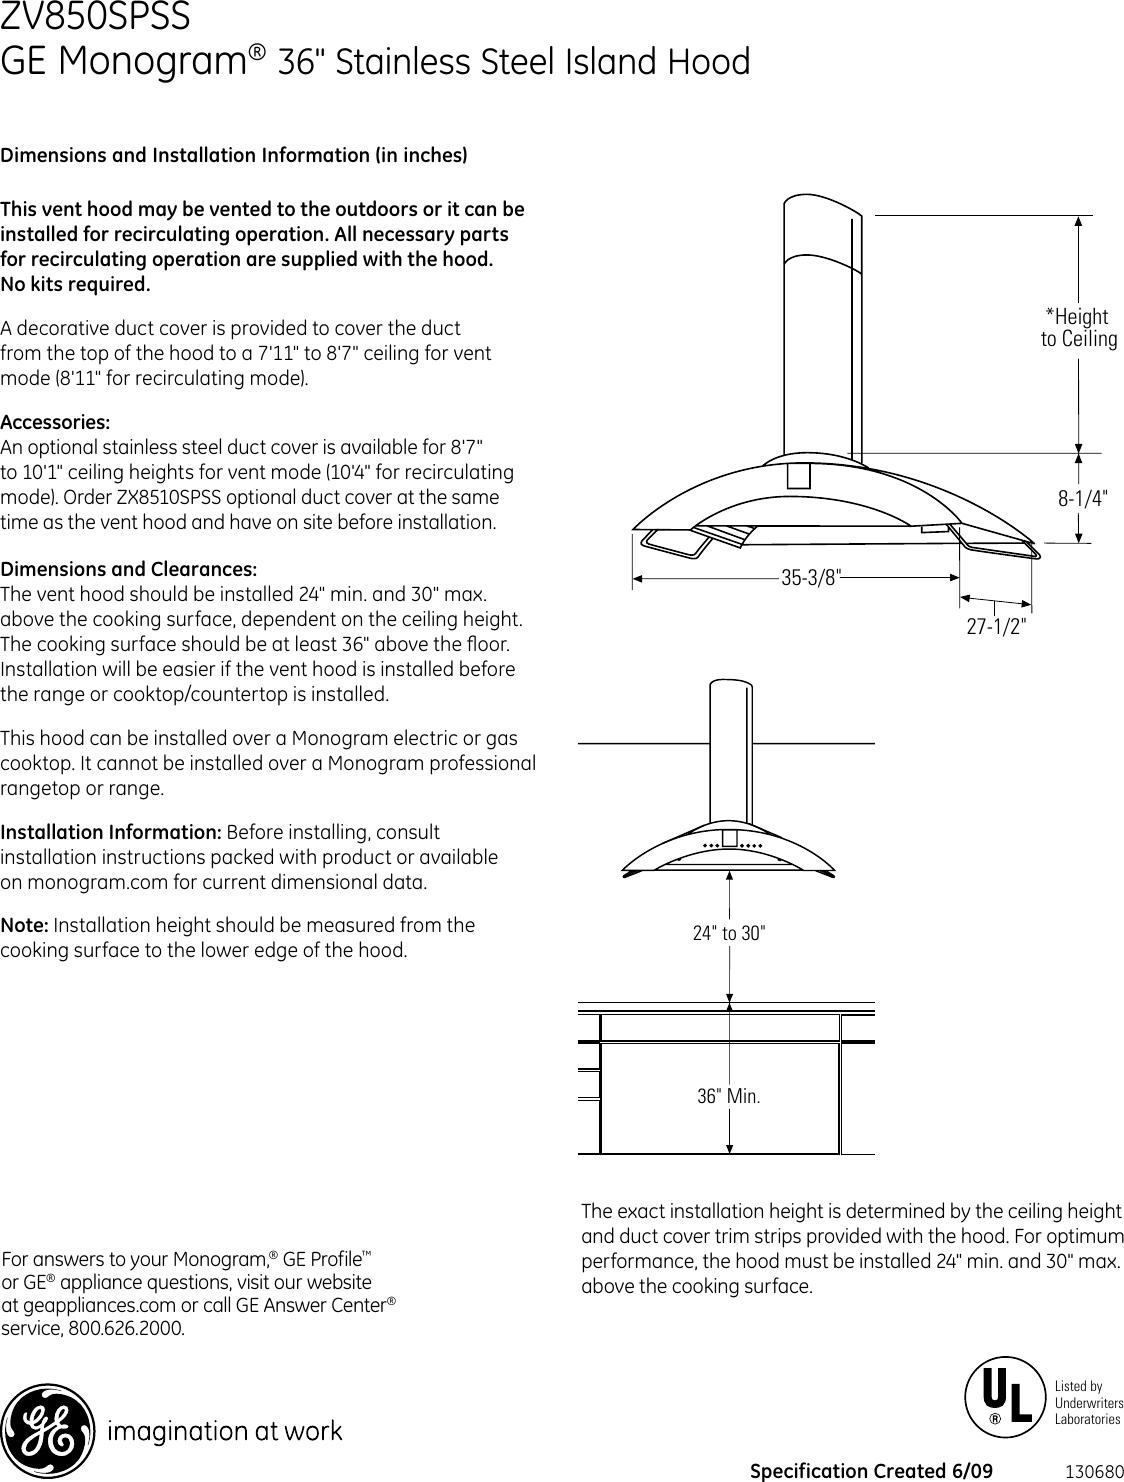 Ge Appliances Monogram Zv850Spss Users Manual